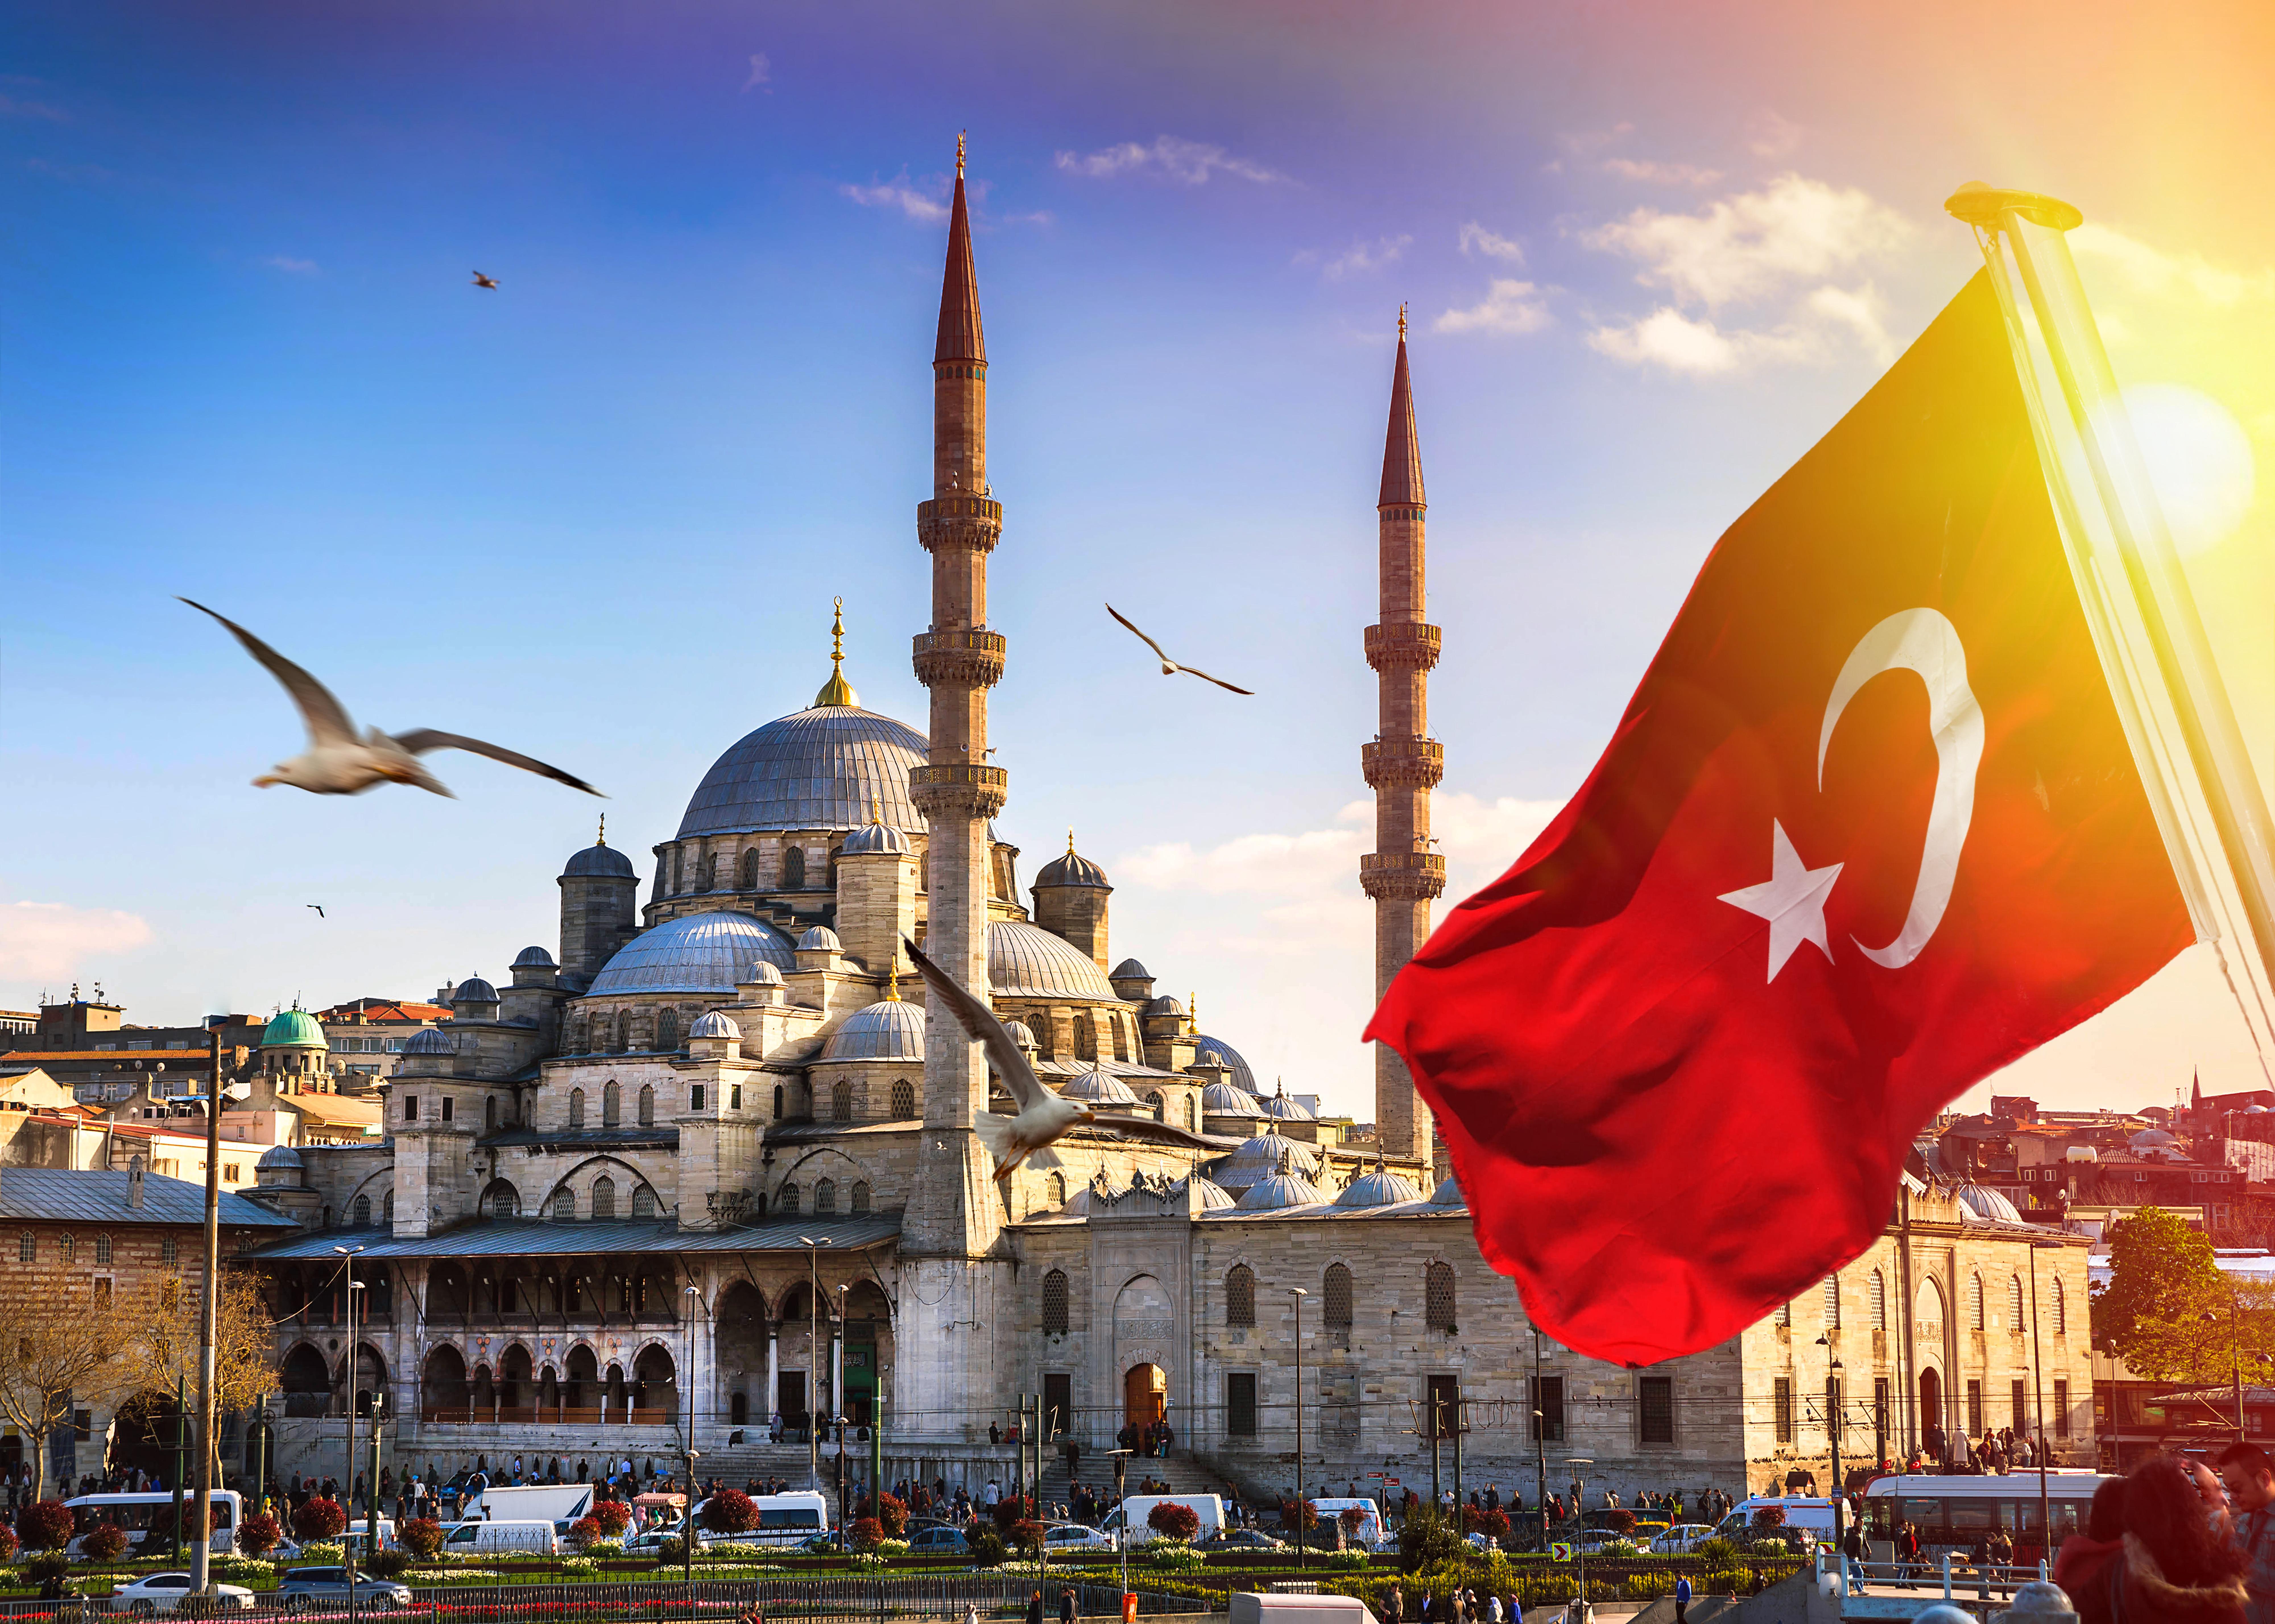 Romania, the Turkey inside the EU? World Bank's study suggests